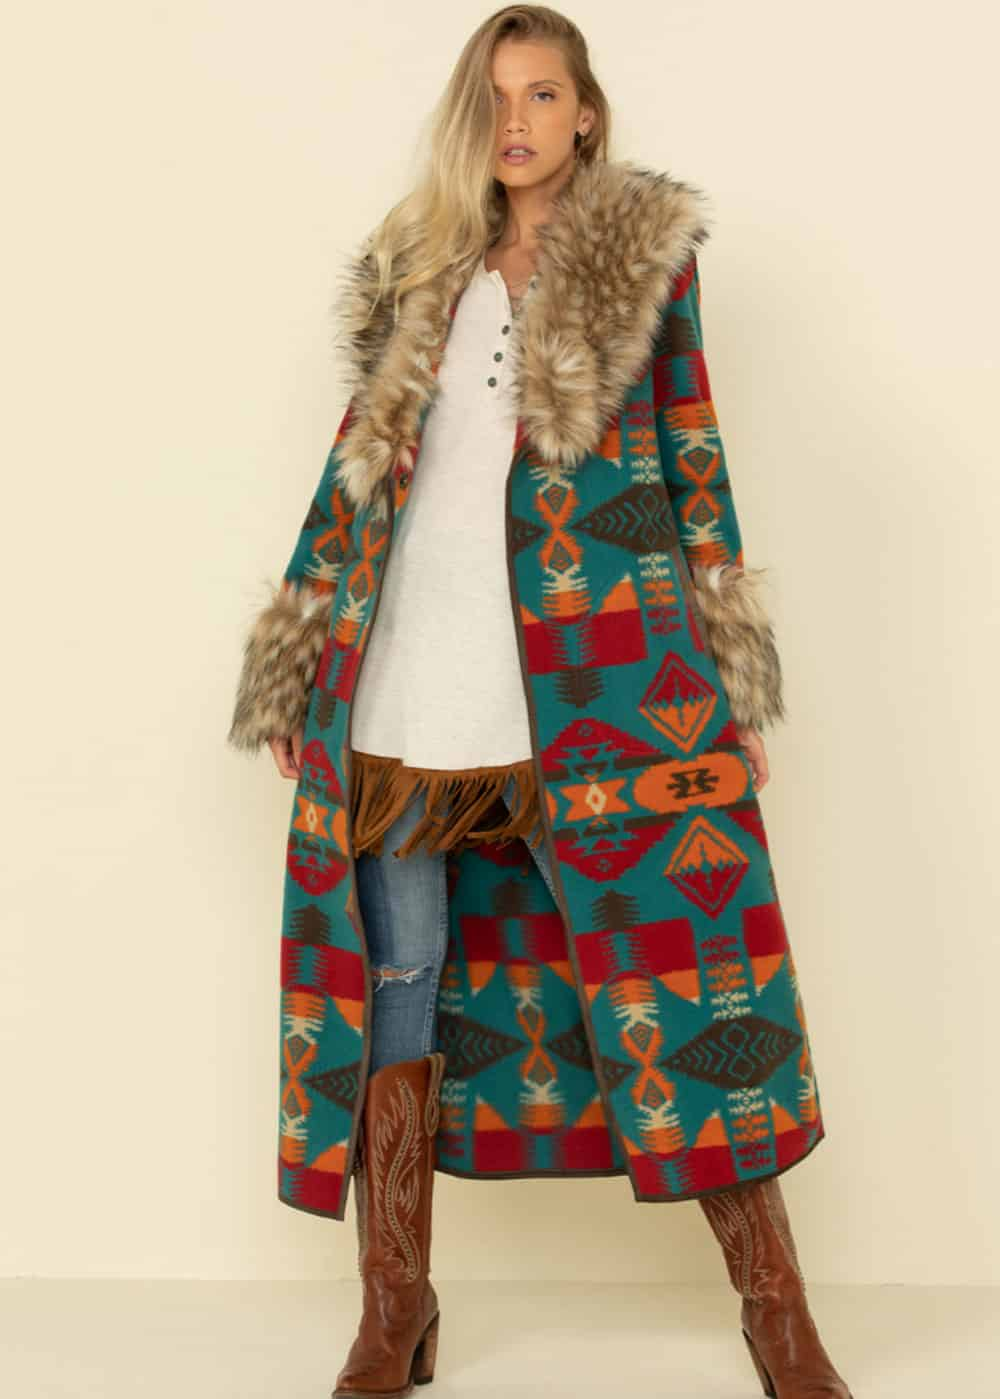 beth dutton style cowgirl magazine